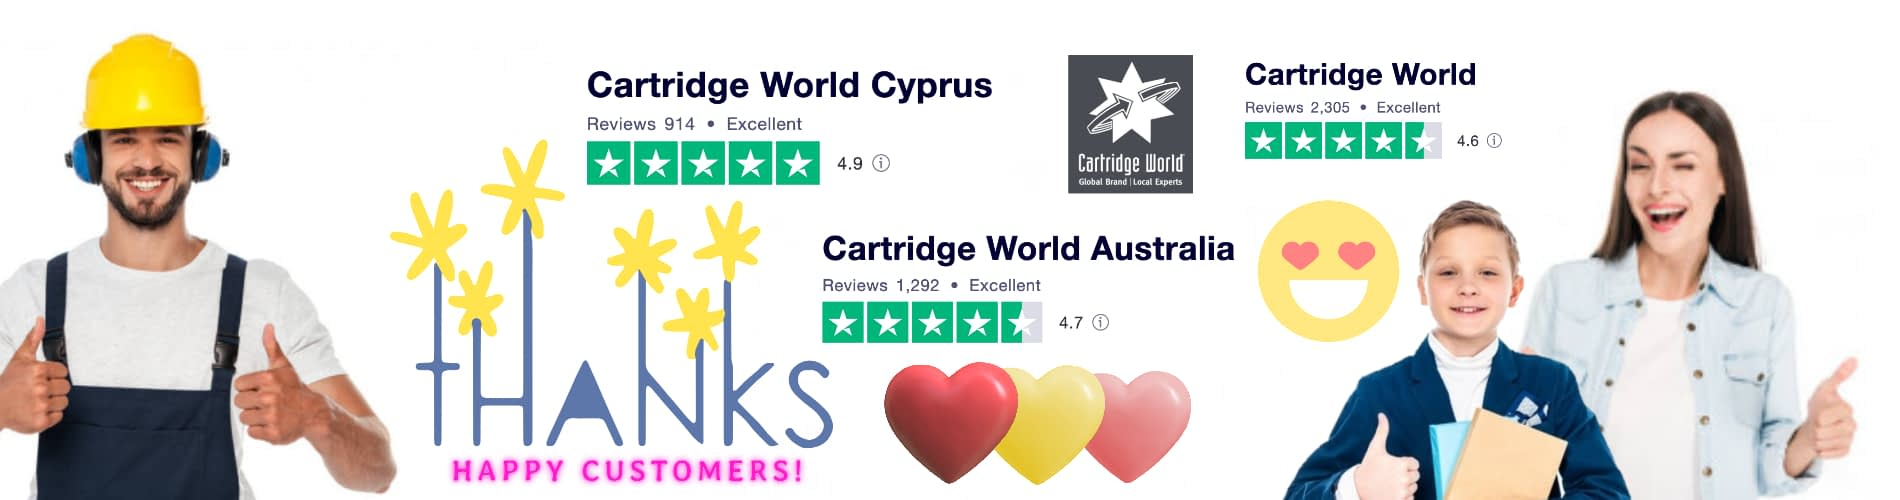 cartridge_world_Happy Customers Banner 1